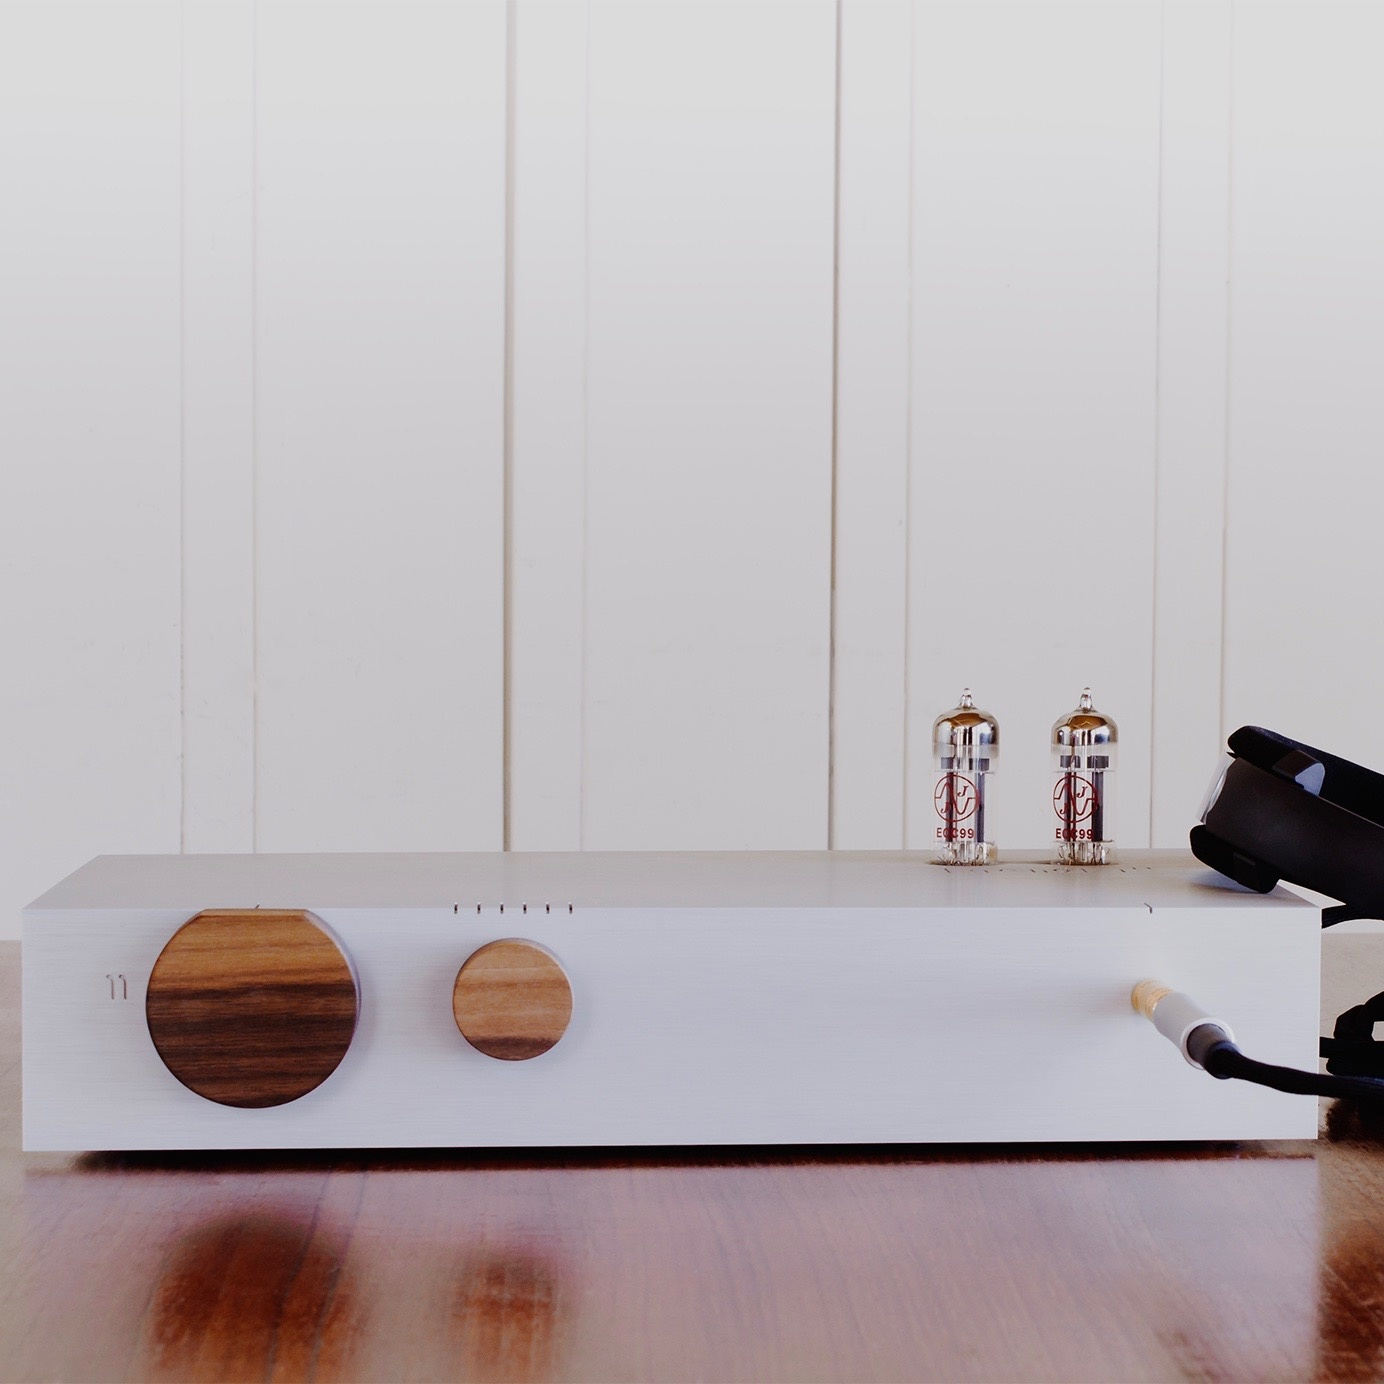 Billie Integrated Hybrid Amplifier with Walnut Knobs